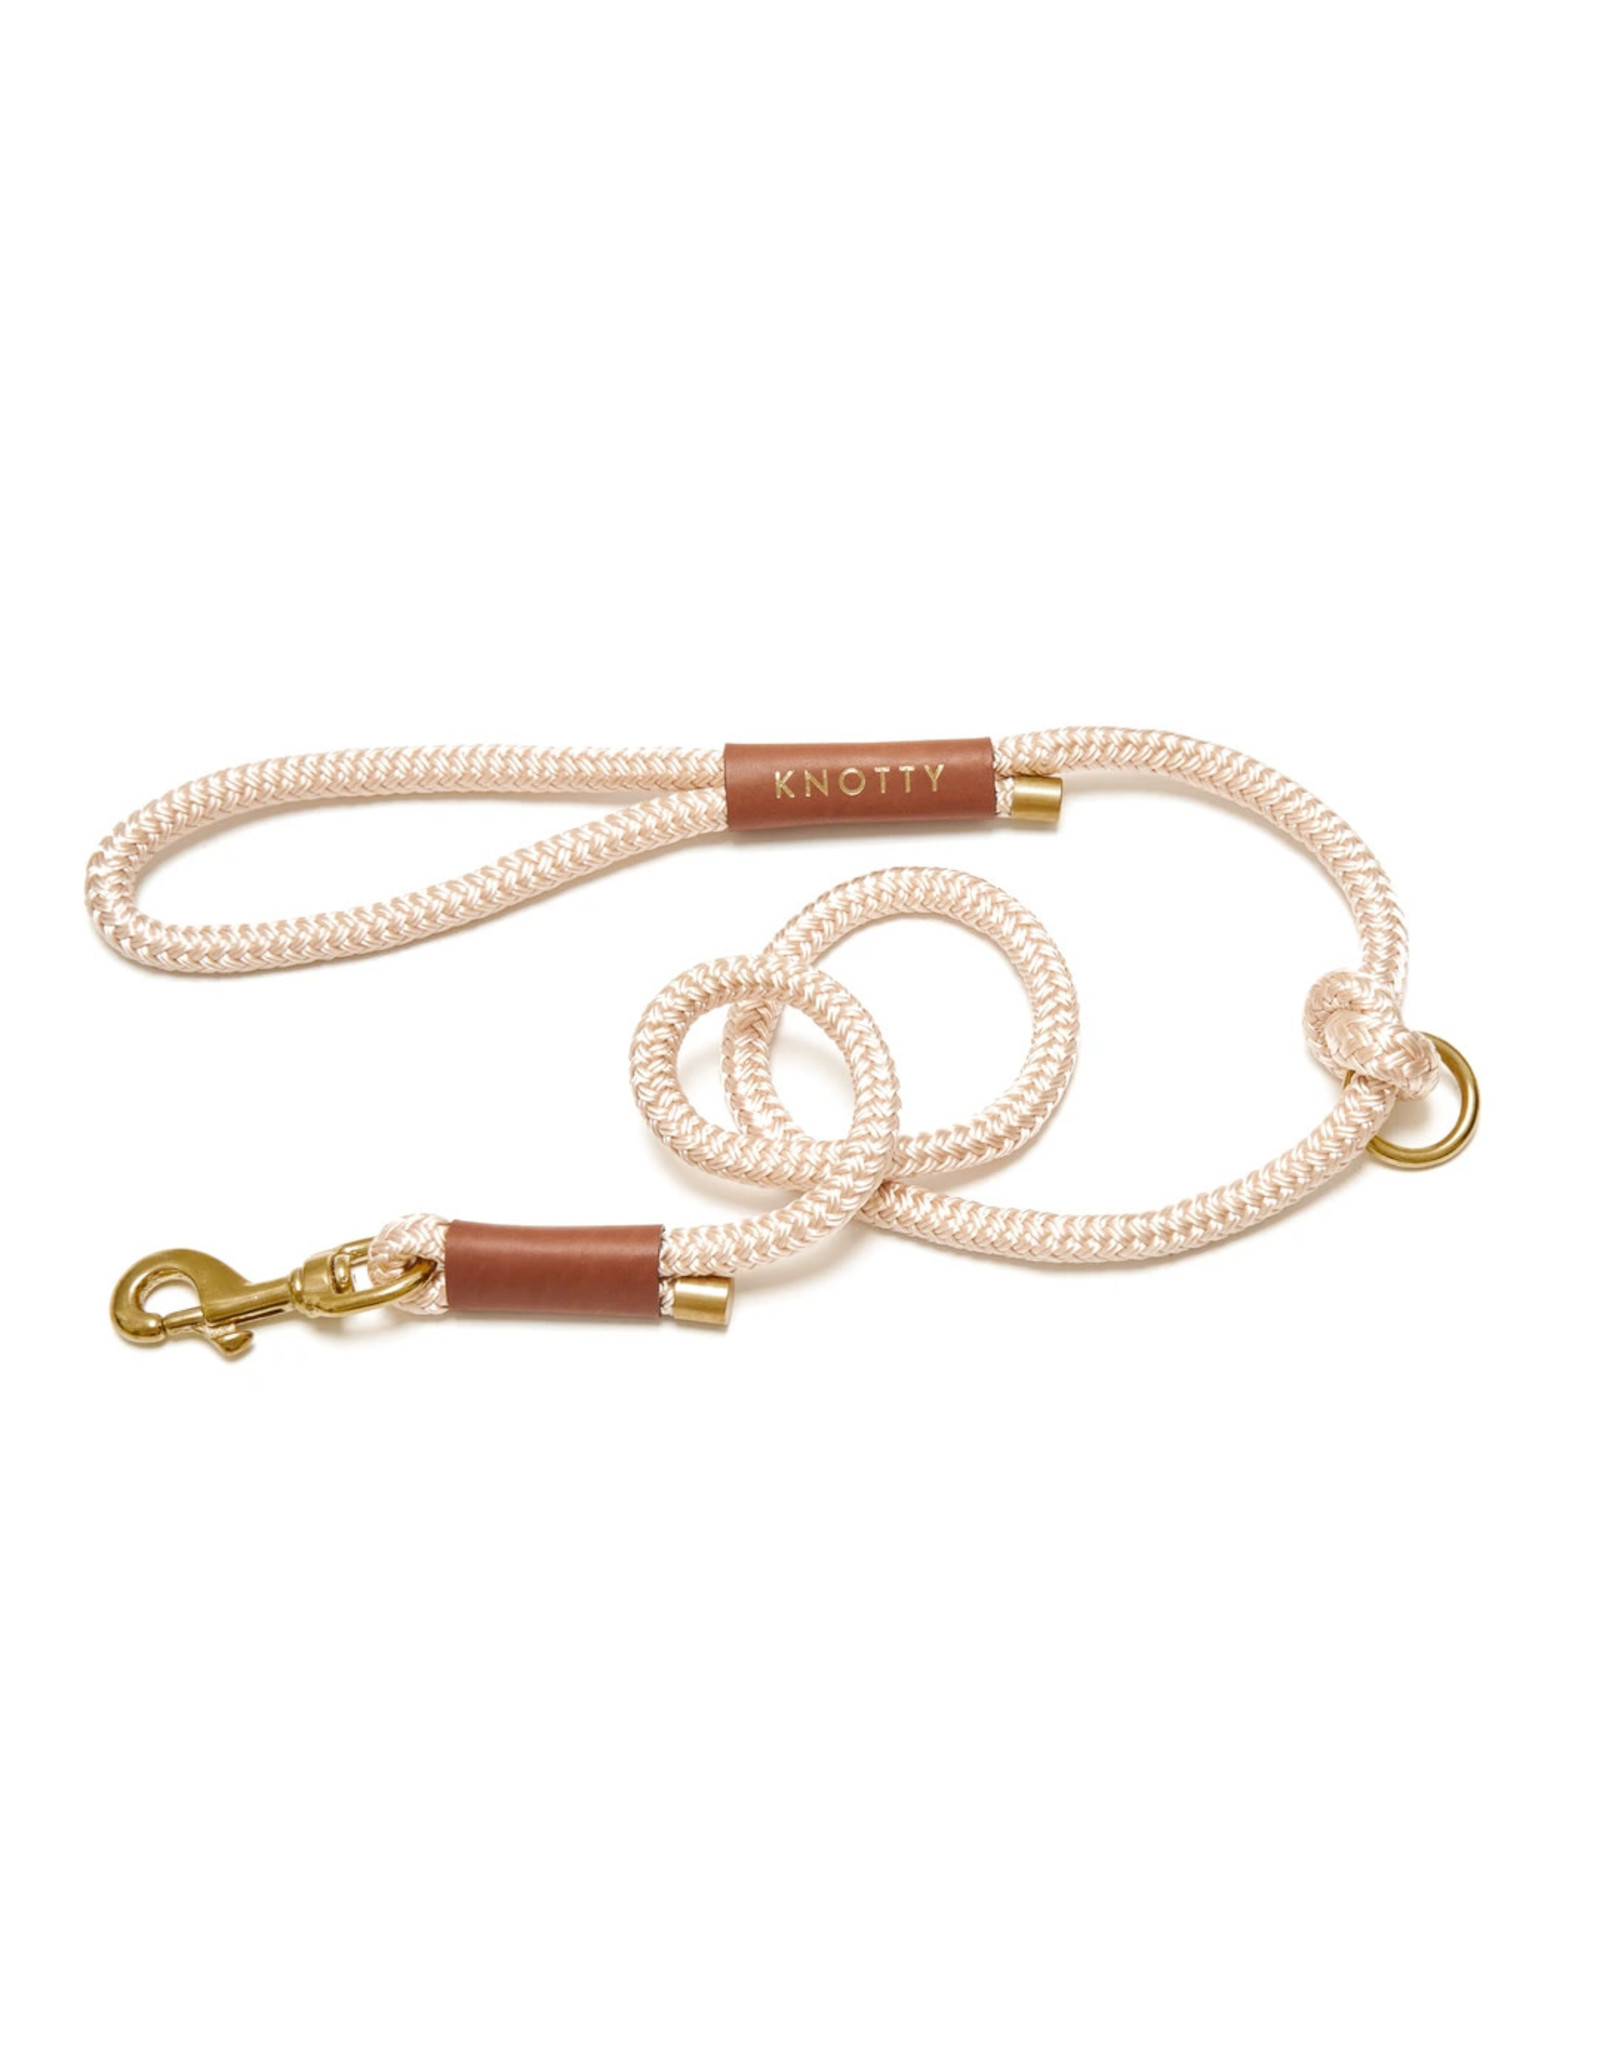 Rope Leash - Champagne